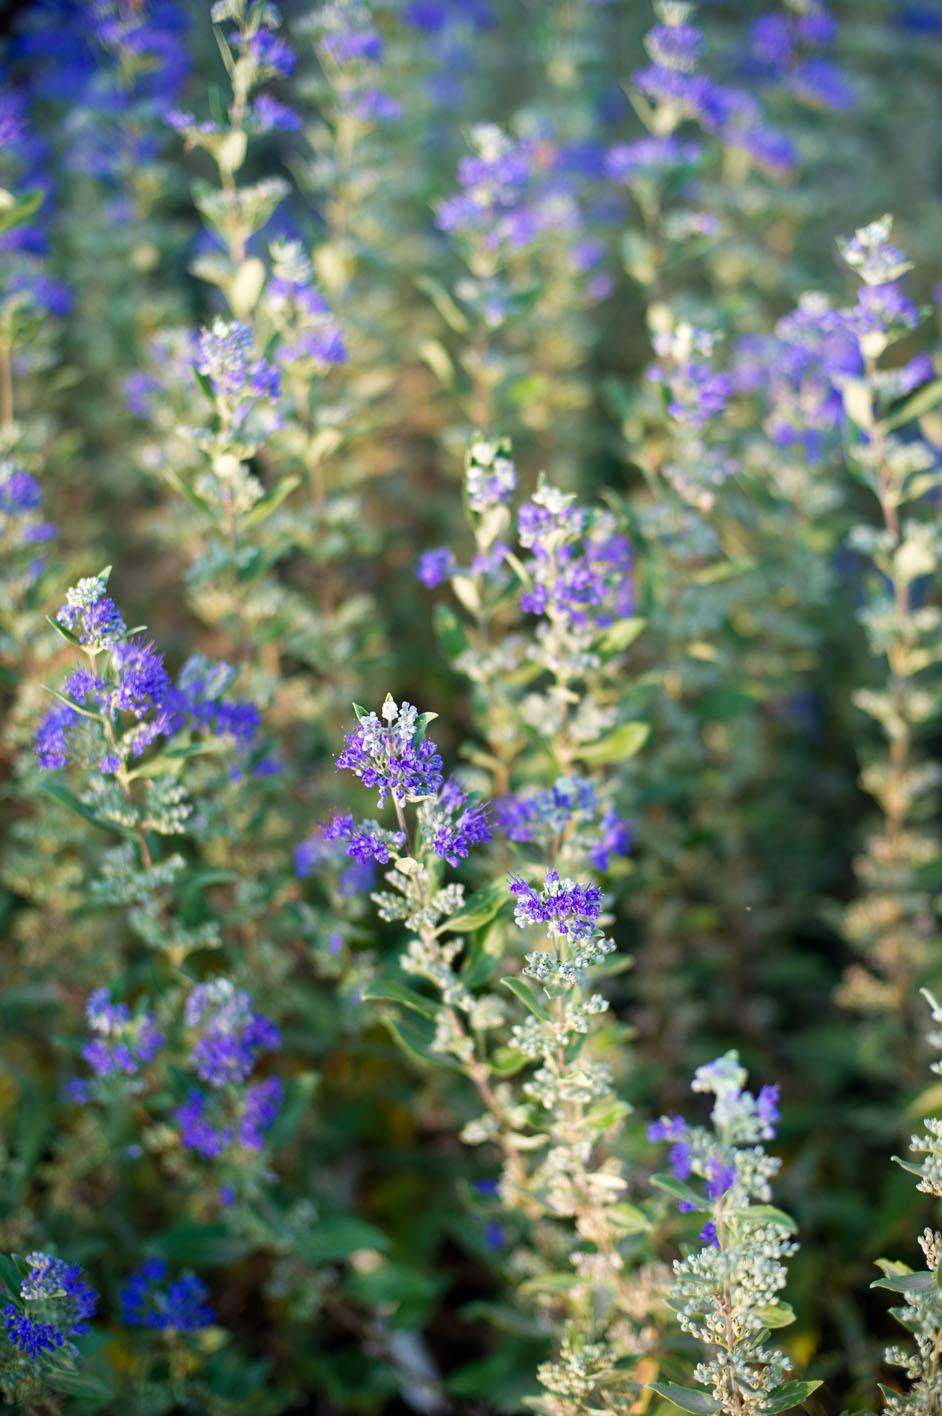 Spiraea Blue Mist For Sale In Boulder Colorado